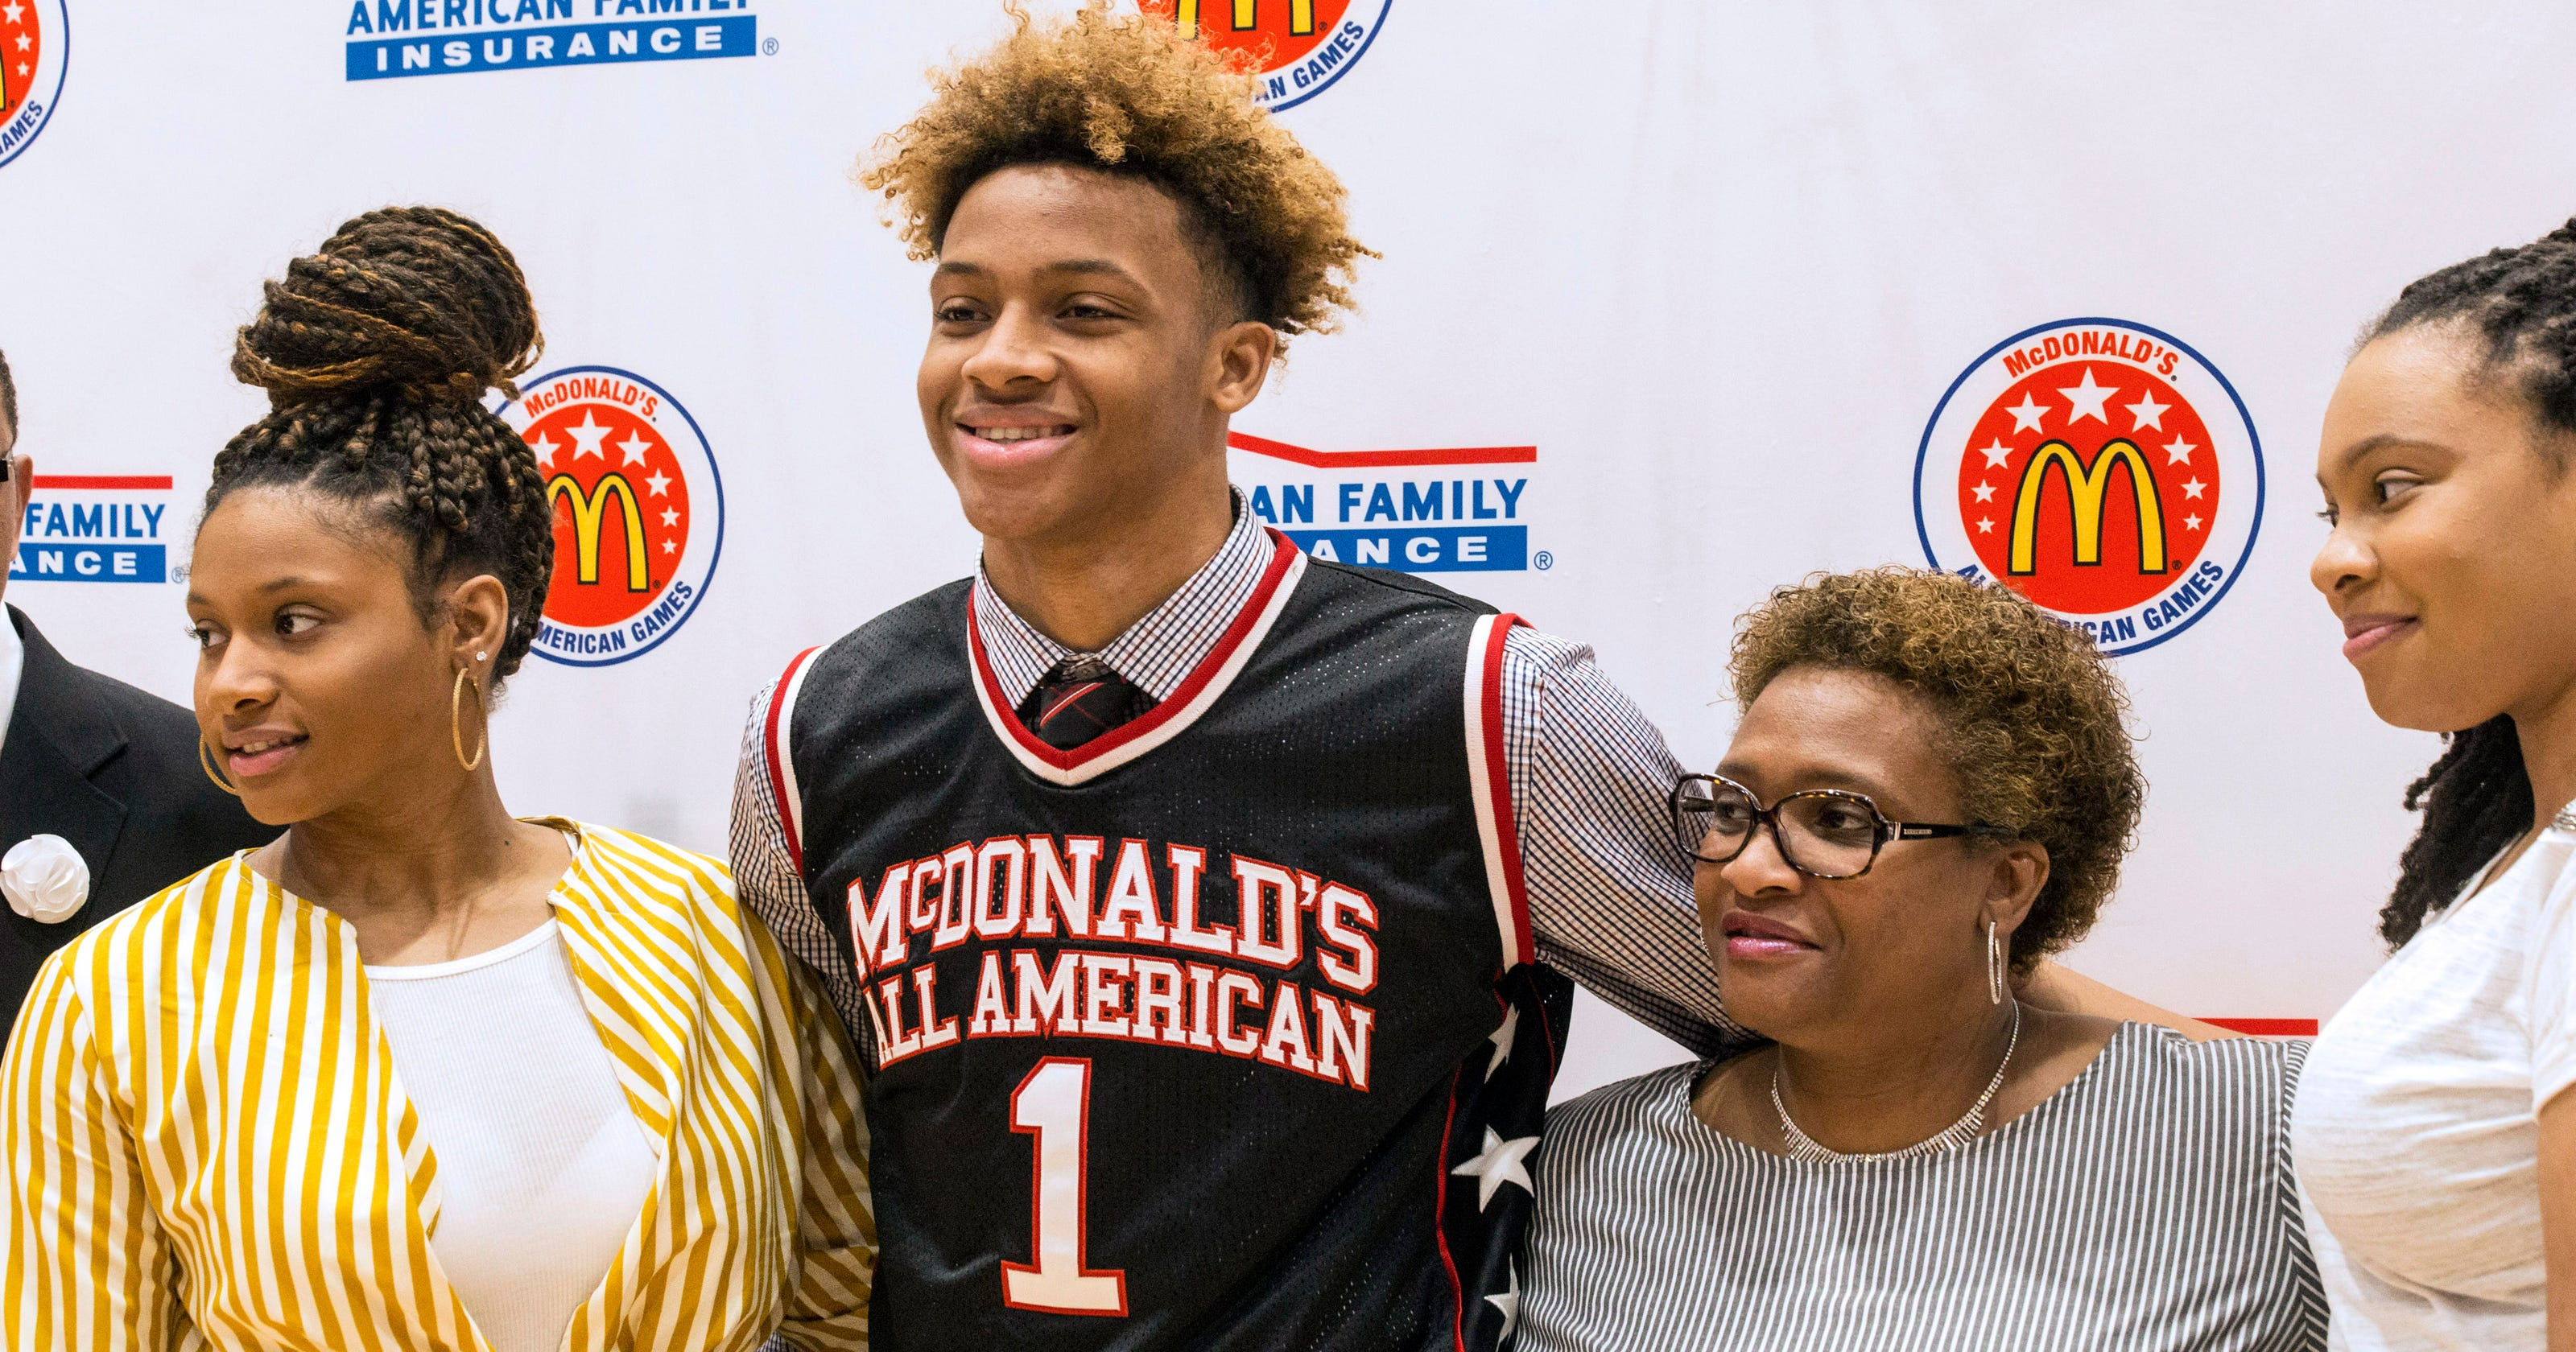 ff032443fac Romeo Langford accepts McDonald s All-American jersey as New Albany  classmates cheer